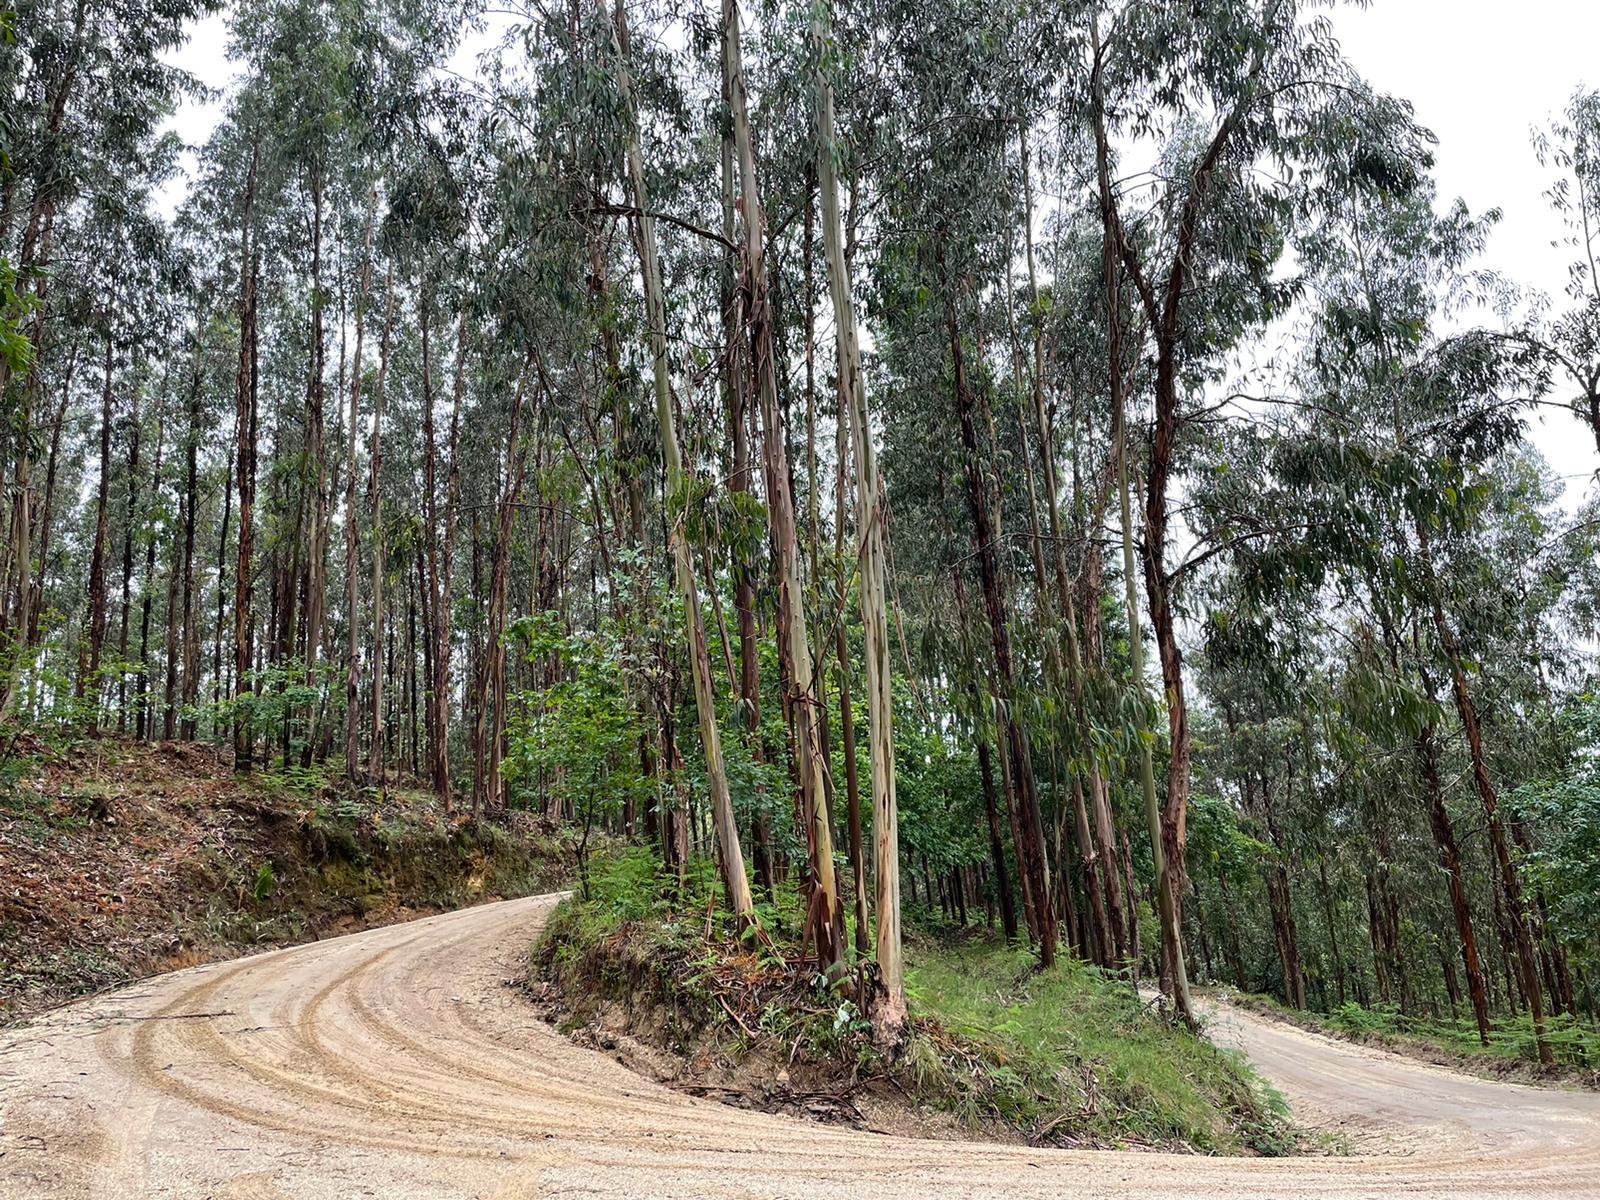 WRC: 54º Vodafone Rallye de Portugal [20-23 de Mayo] E1wohl8WQAElfF5?format=jpg&name=large